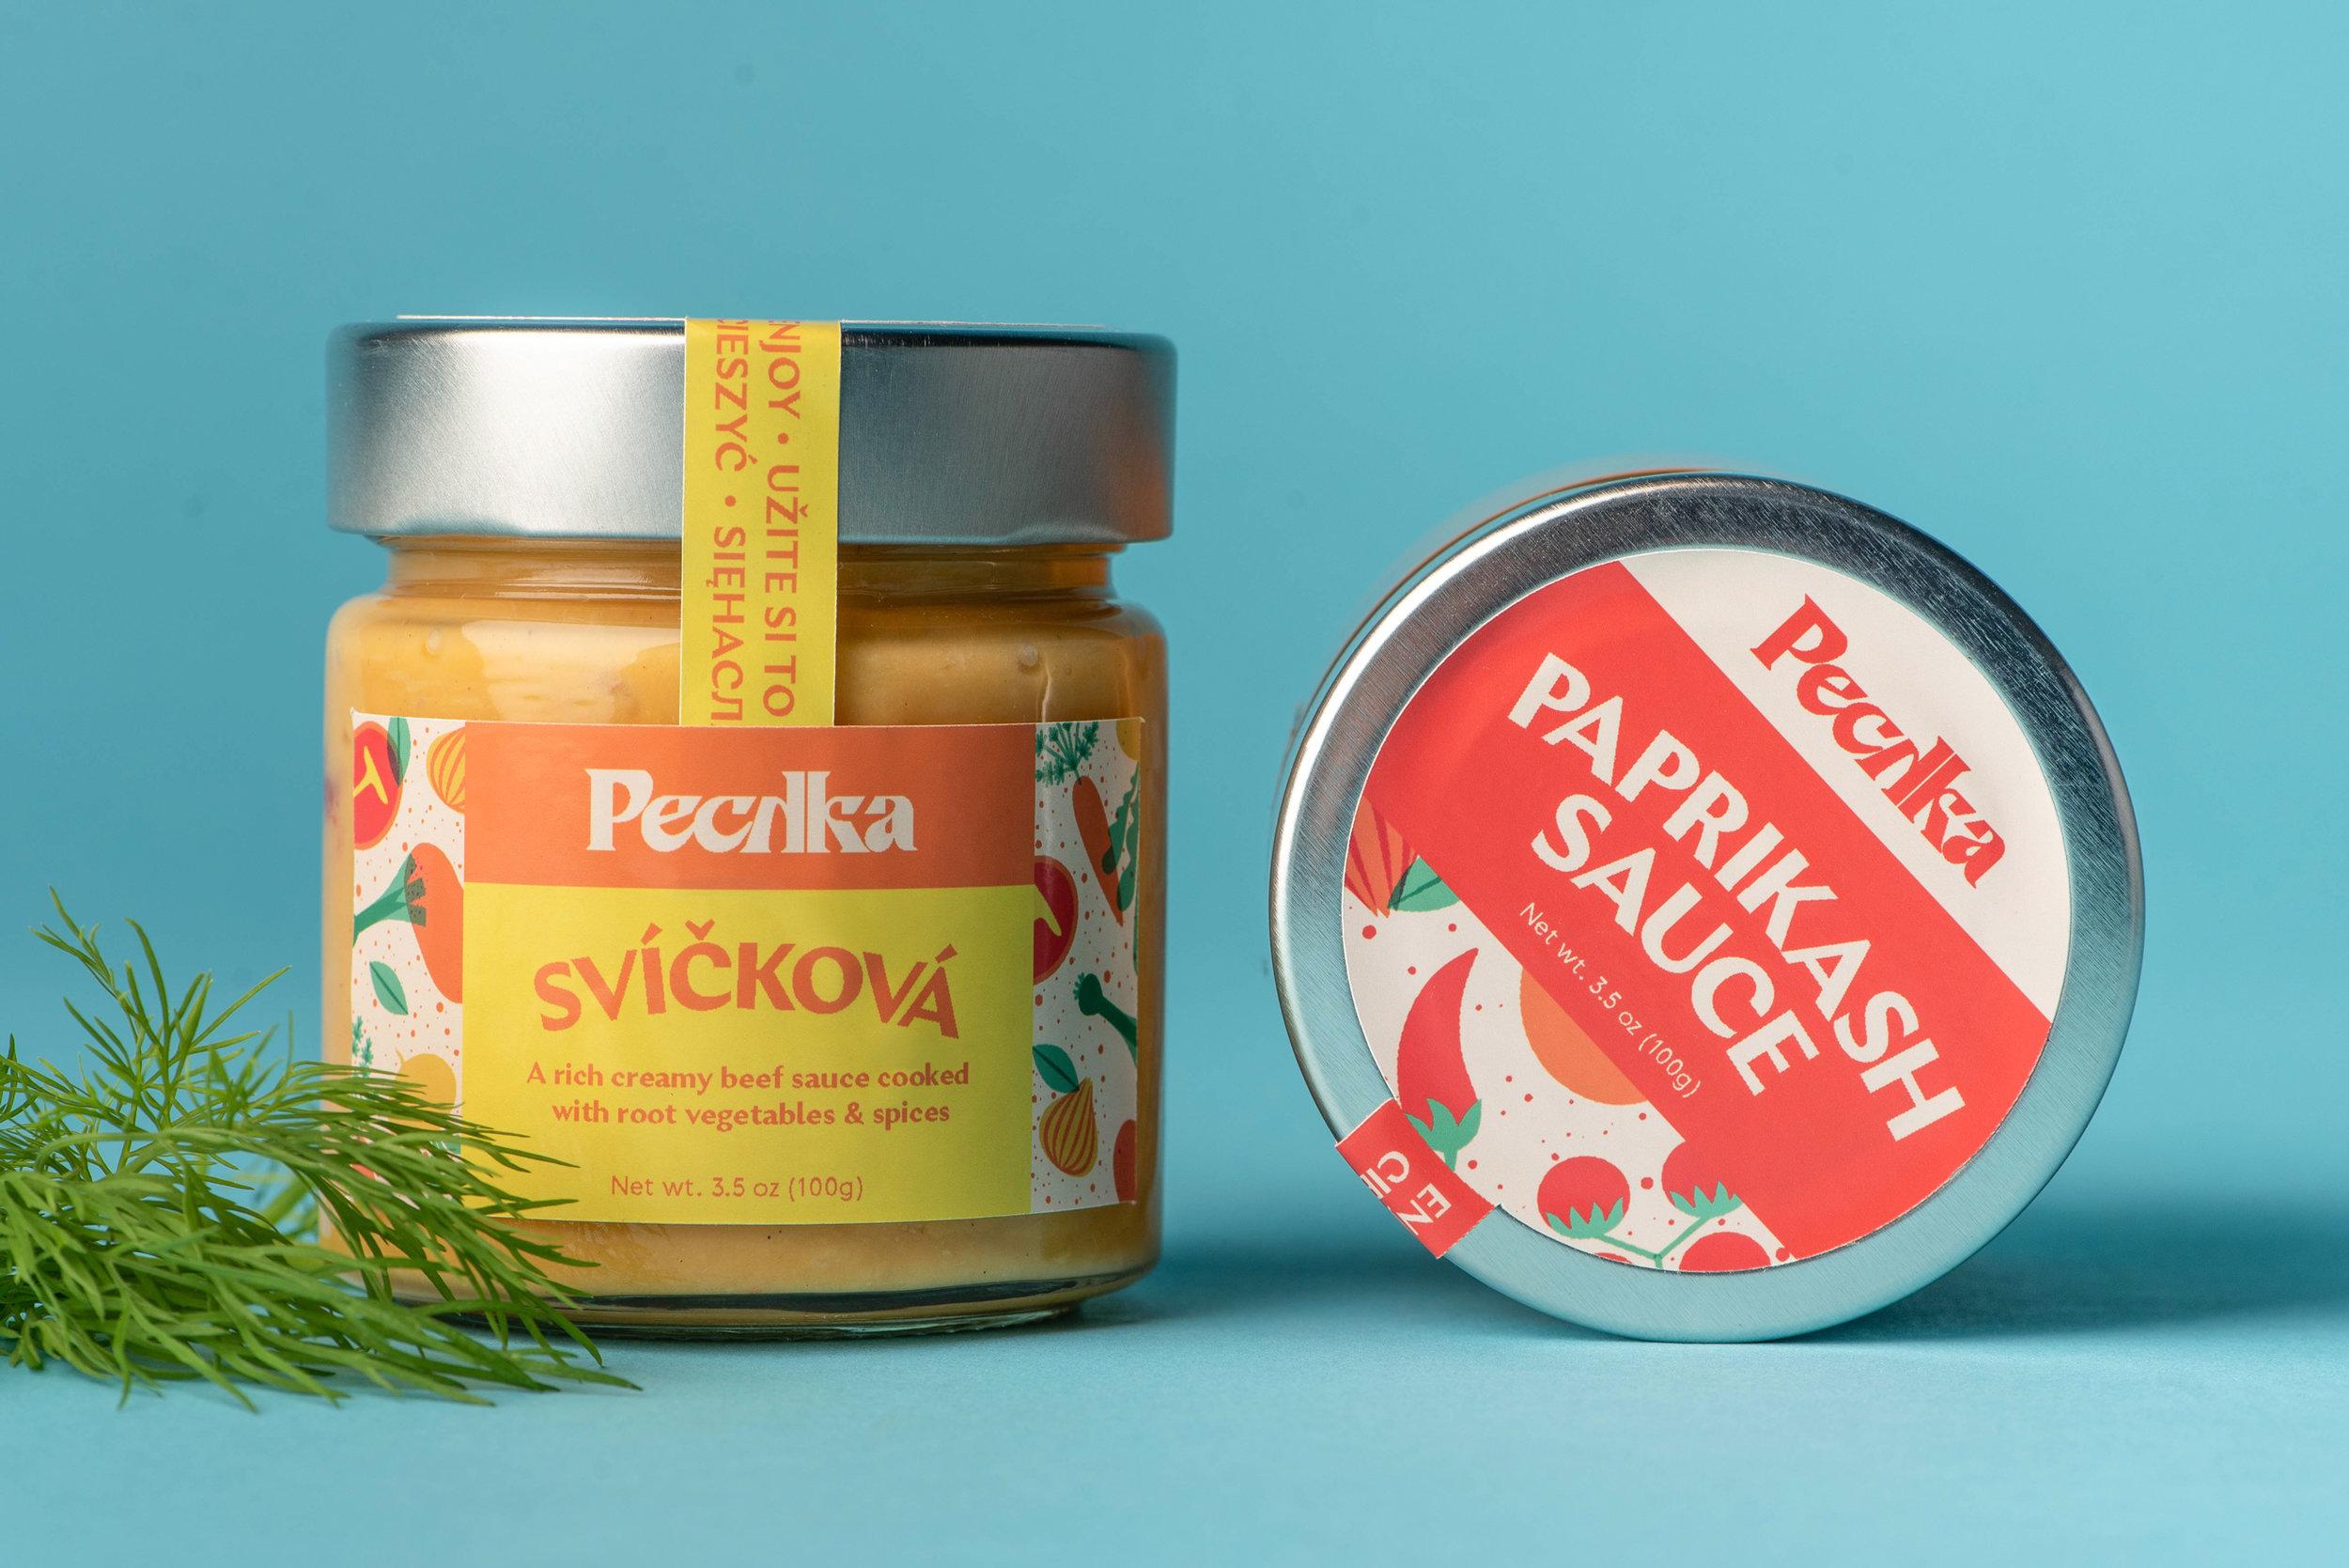 pechka_sauce_web.jpg